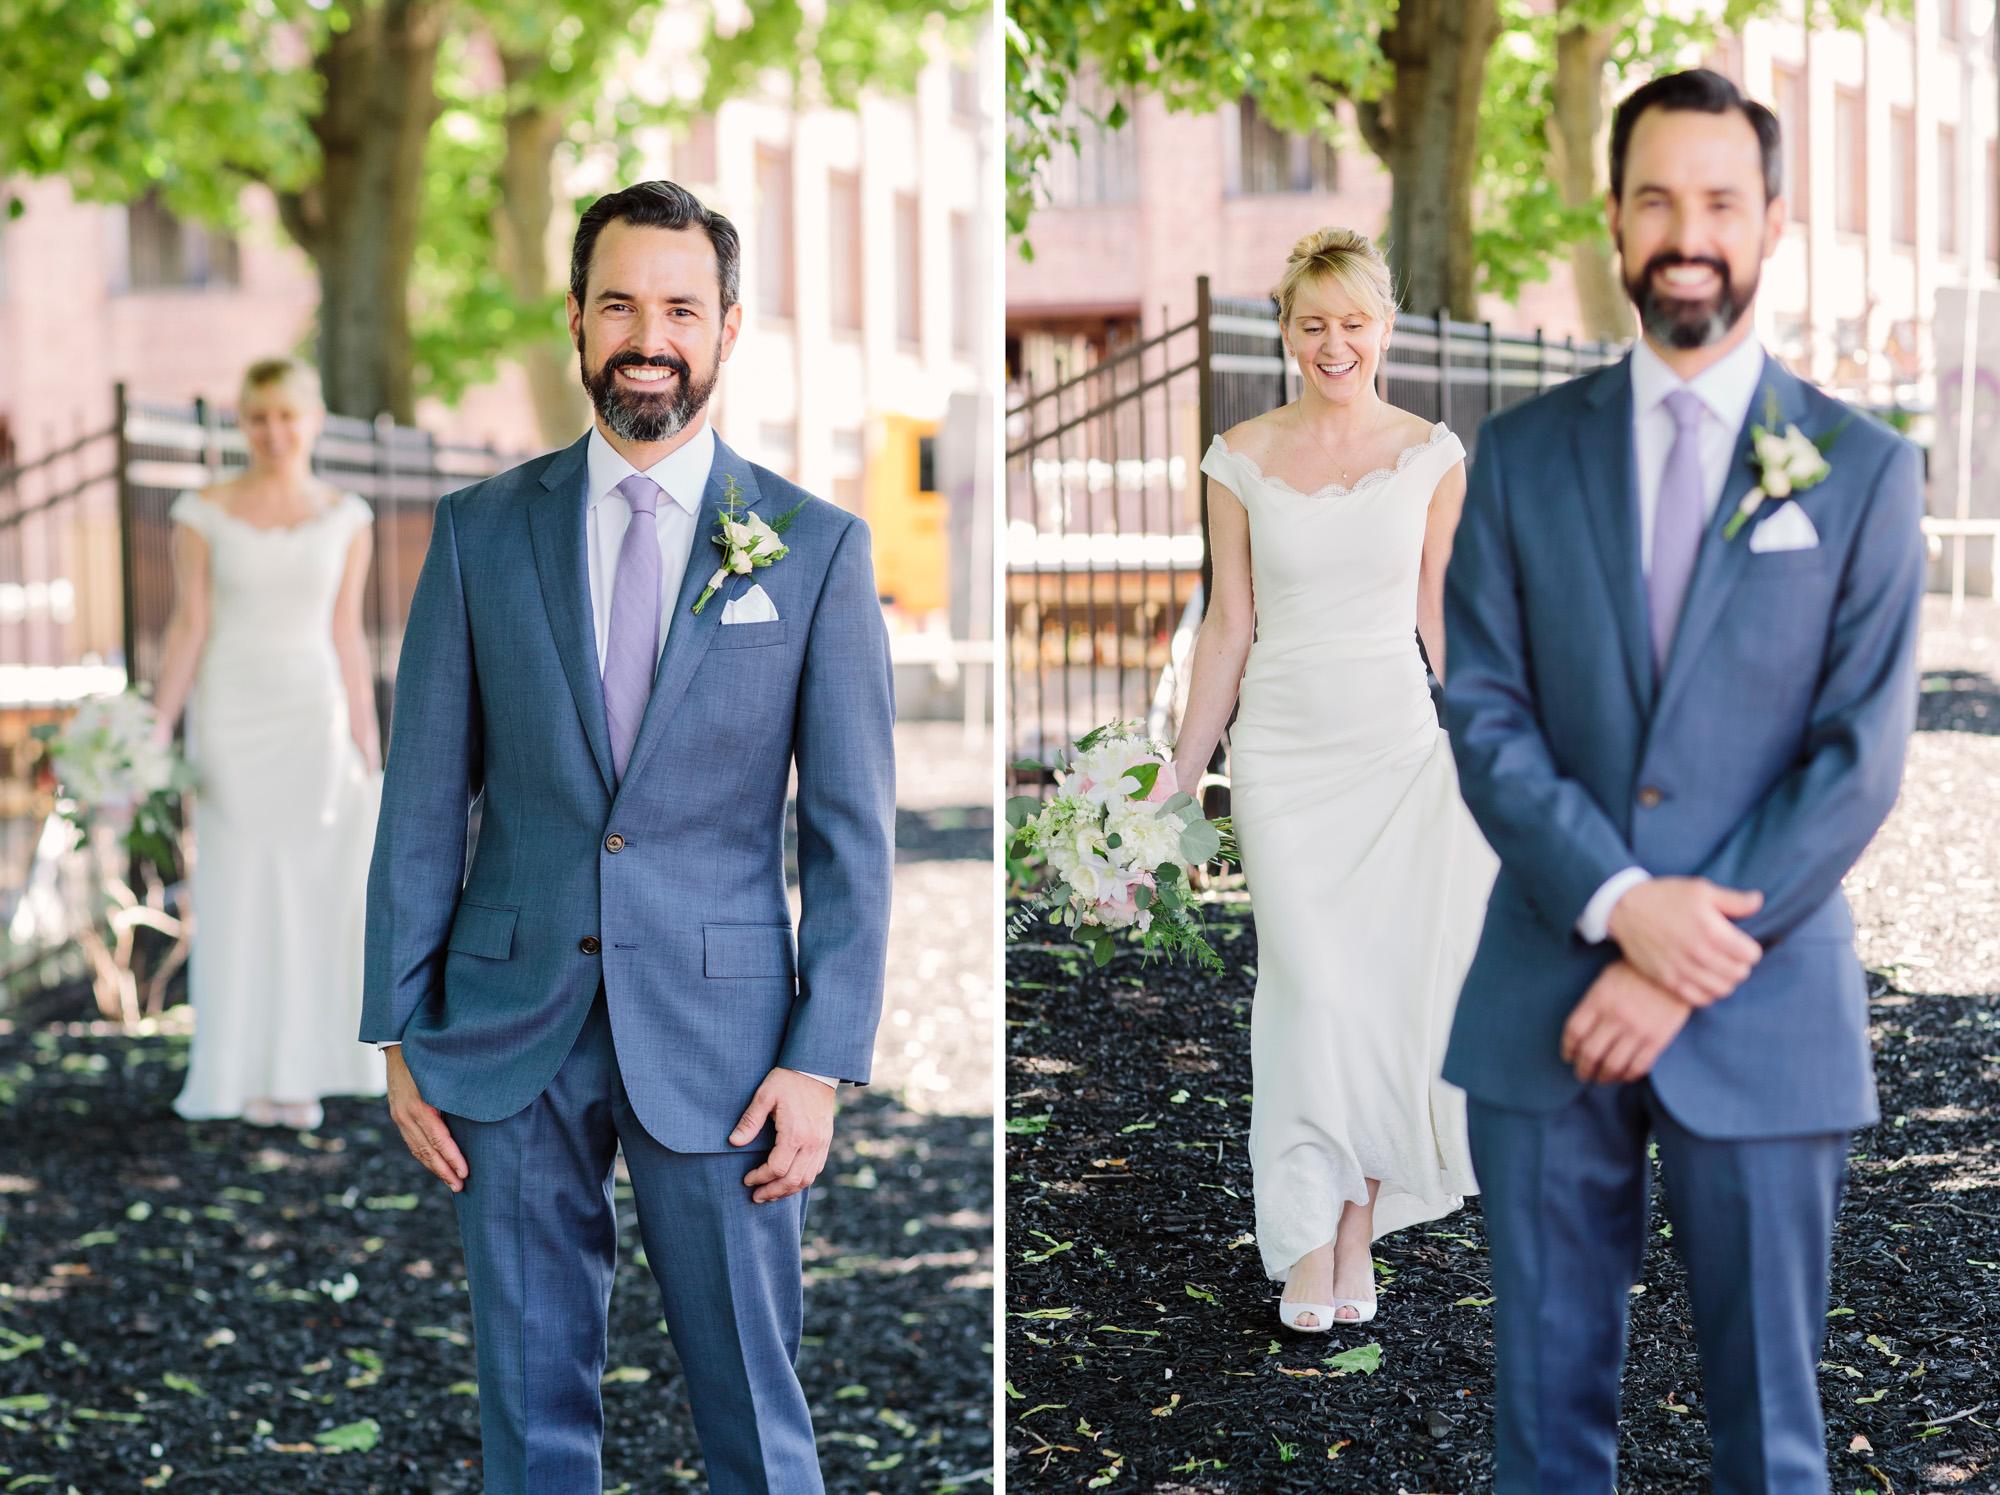 28_Rowan_Brian_The_Roundhouse_Wedding_Beacon_NY_Tanya_Salazar_Photography.jpg